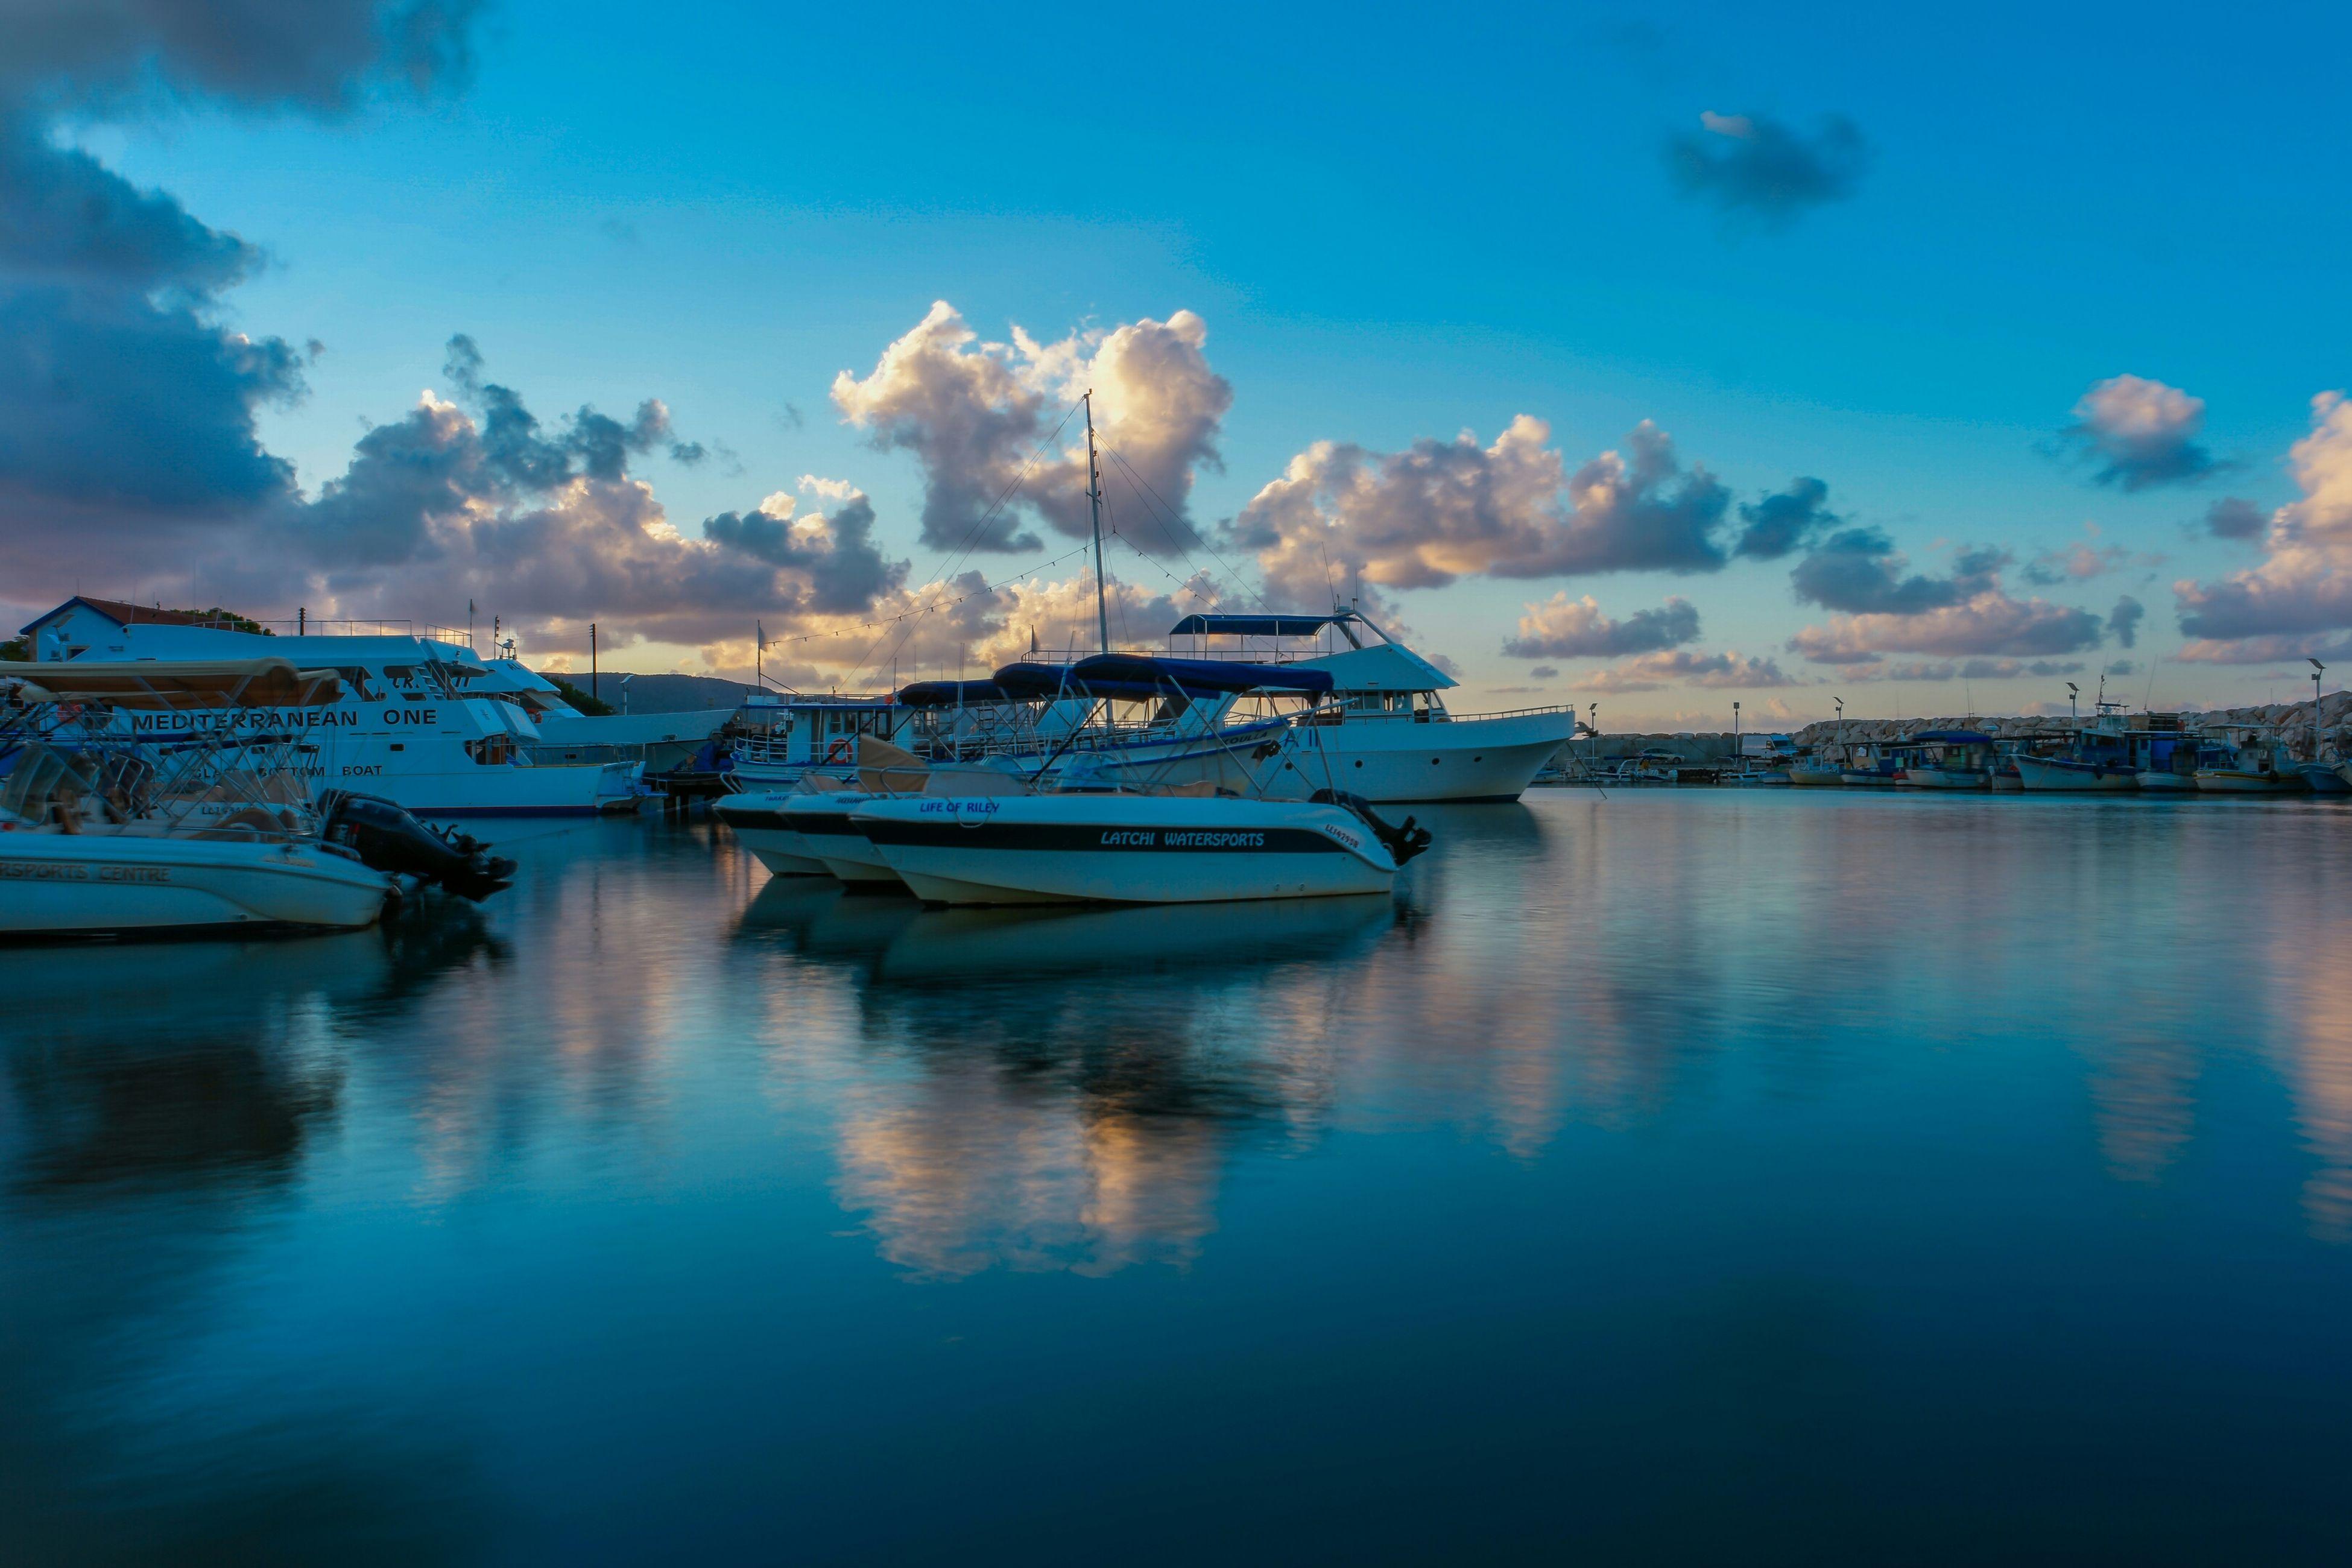 Cyprus Latchi Watersports Cyprus Harbour north cyprus cyprus bay